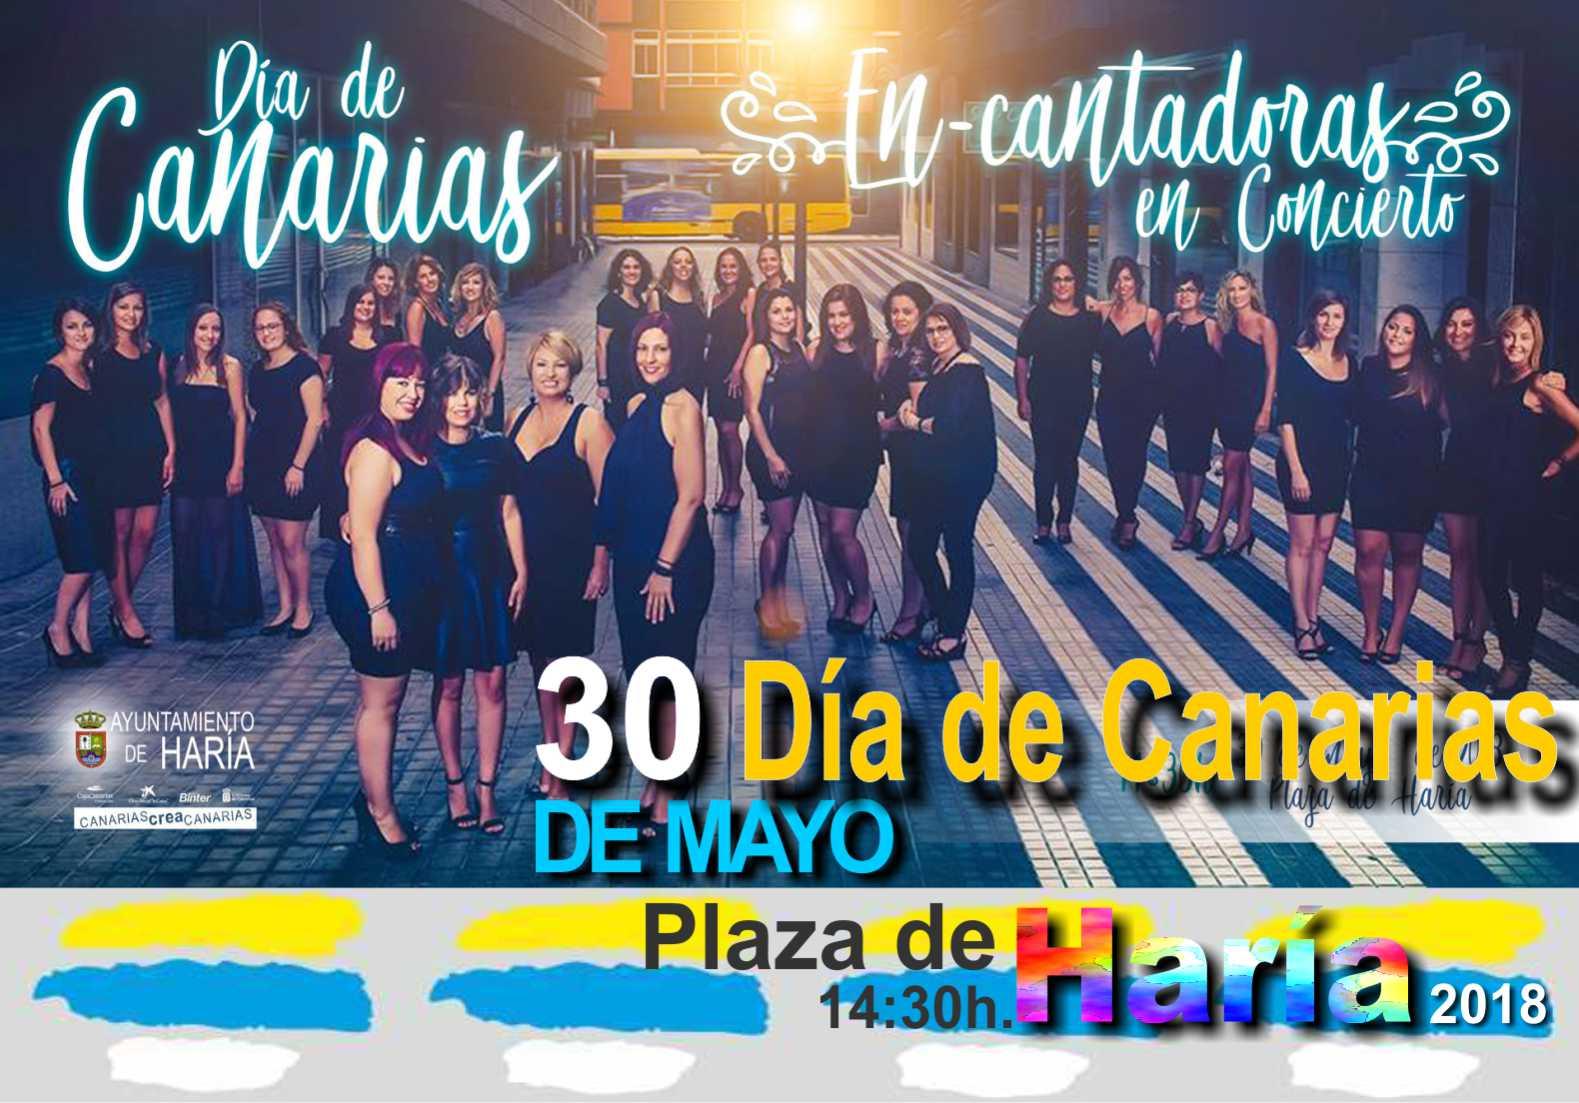 30 de mayo dia de Canarias